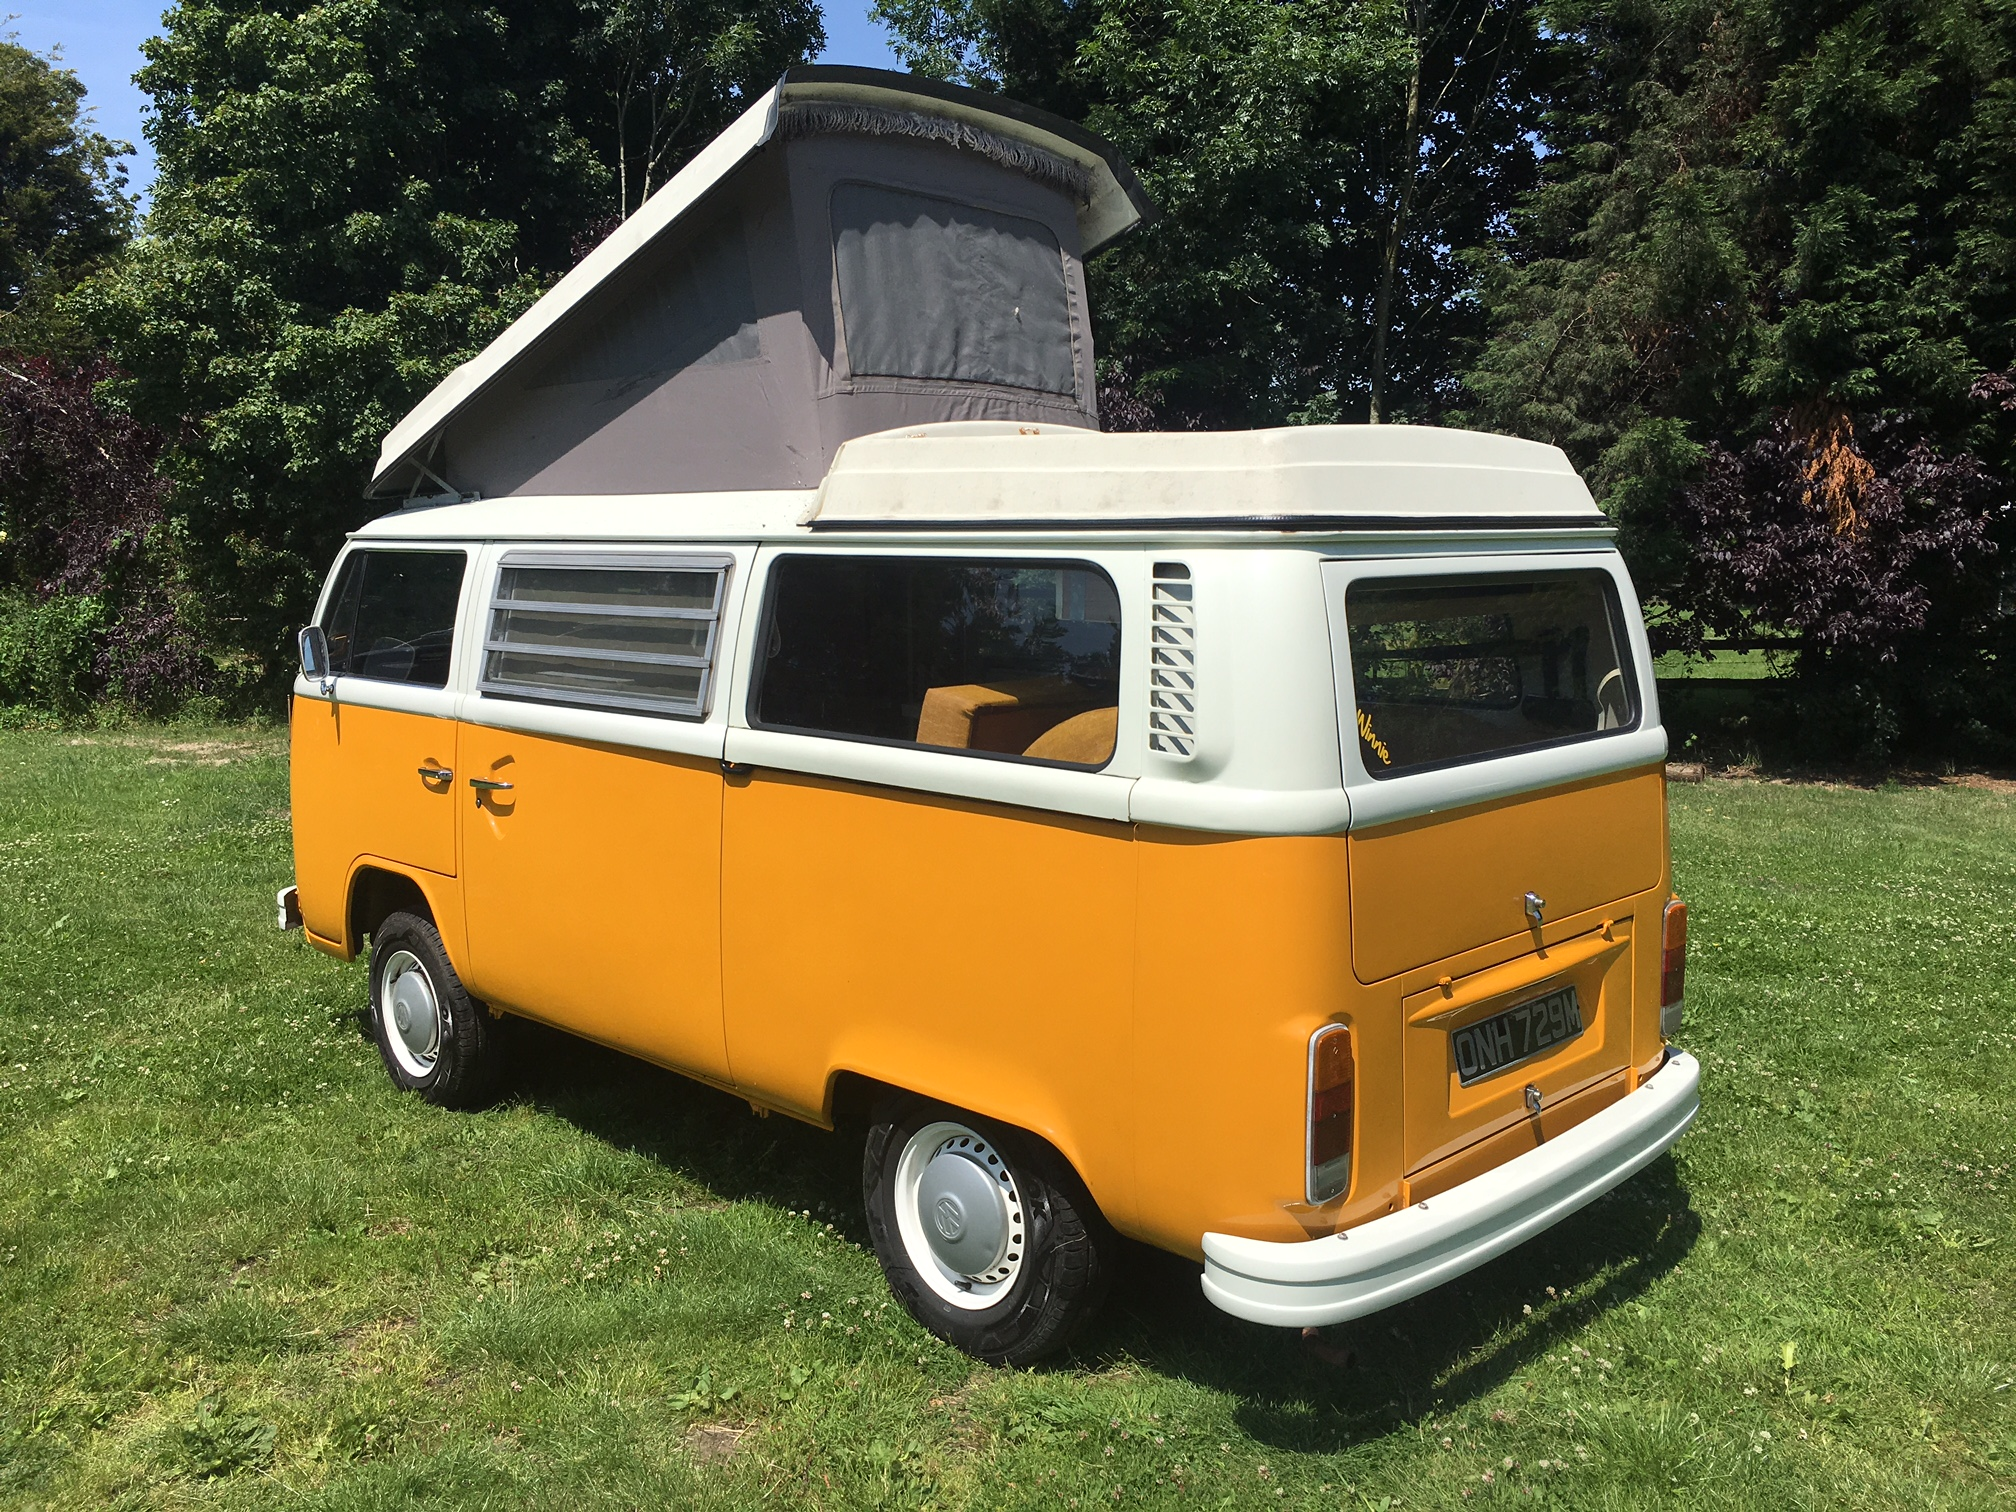 1973-5-berth-westfalia-campervan-rear